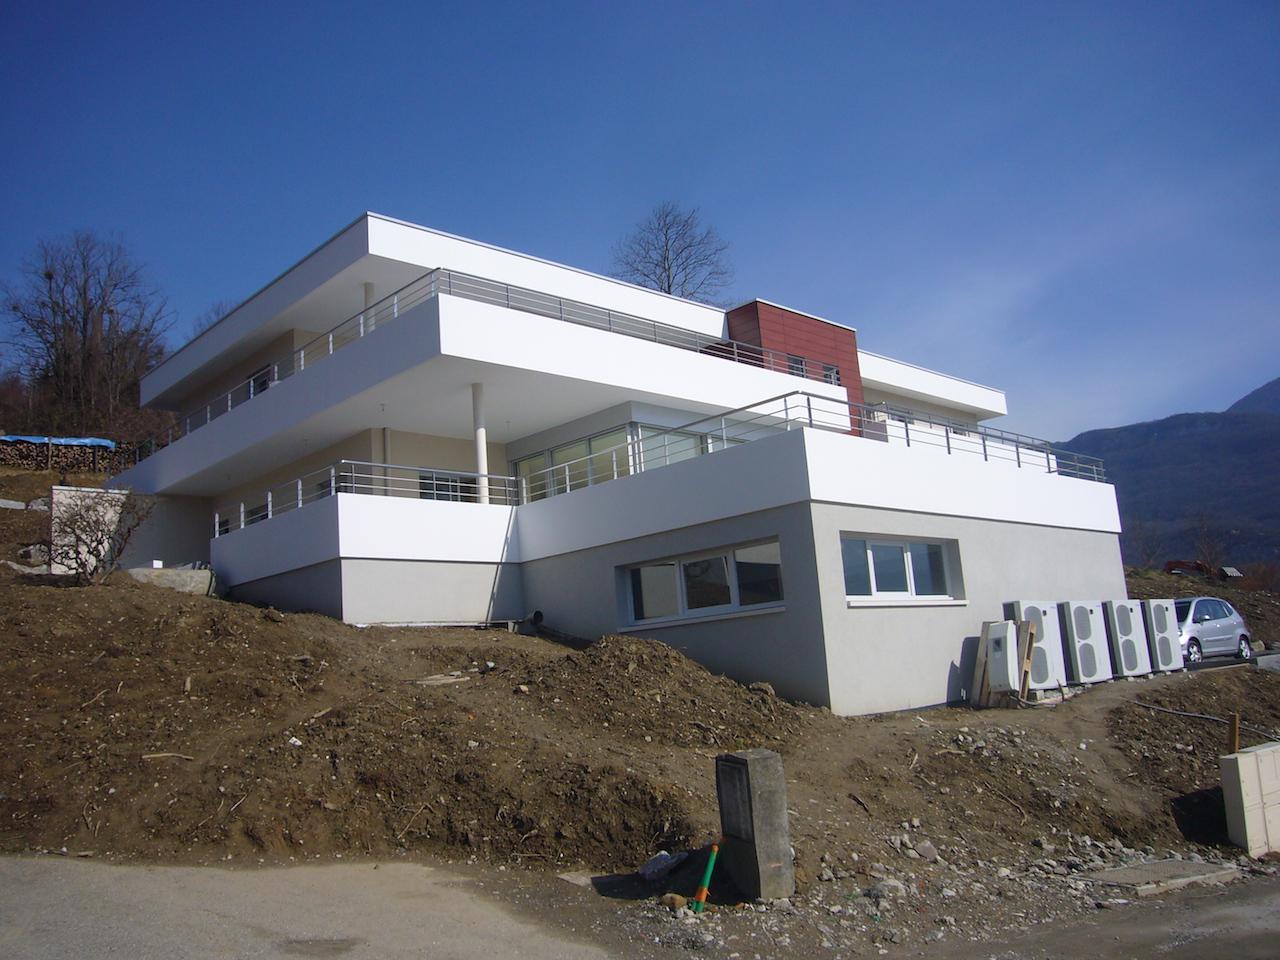 Maison individuelle bassens atelier raymond brun for Commercial maisons individuelles